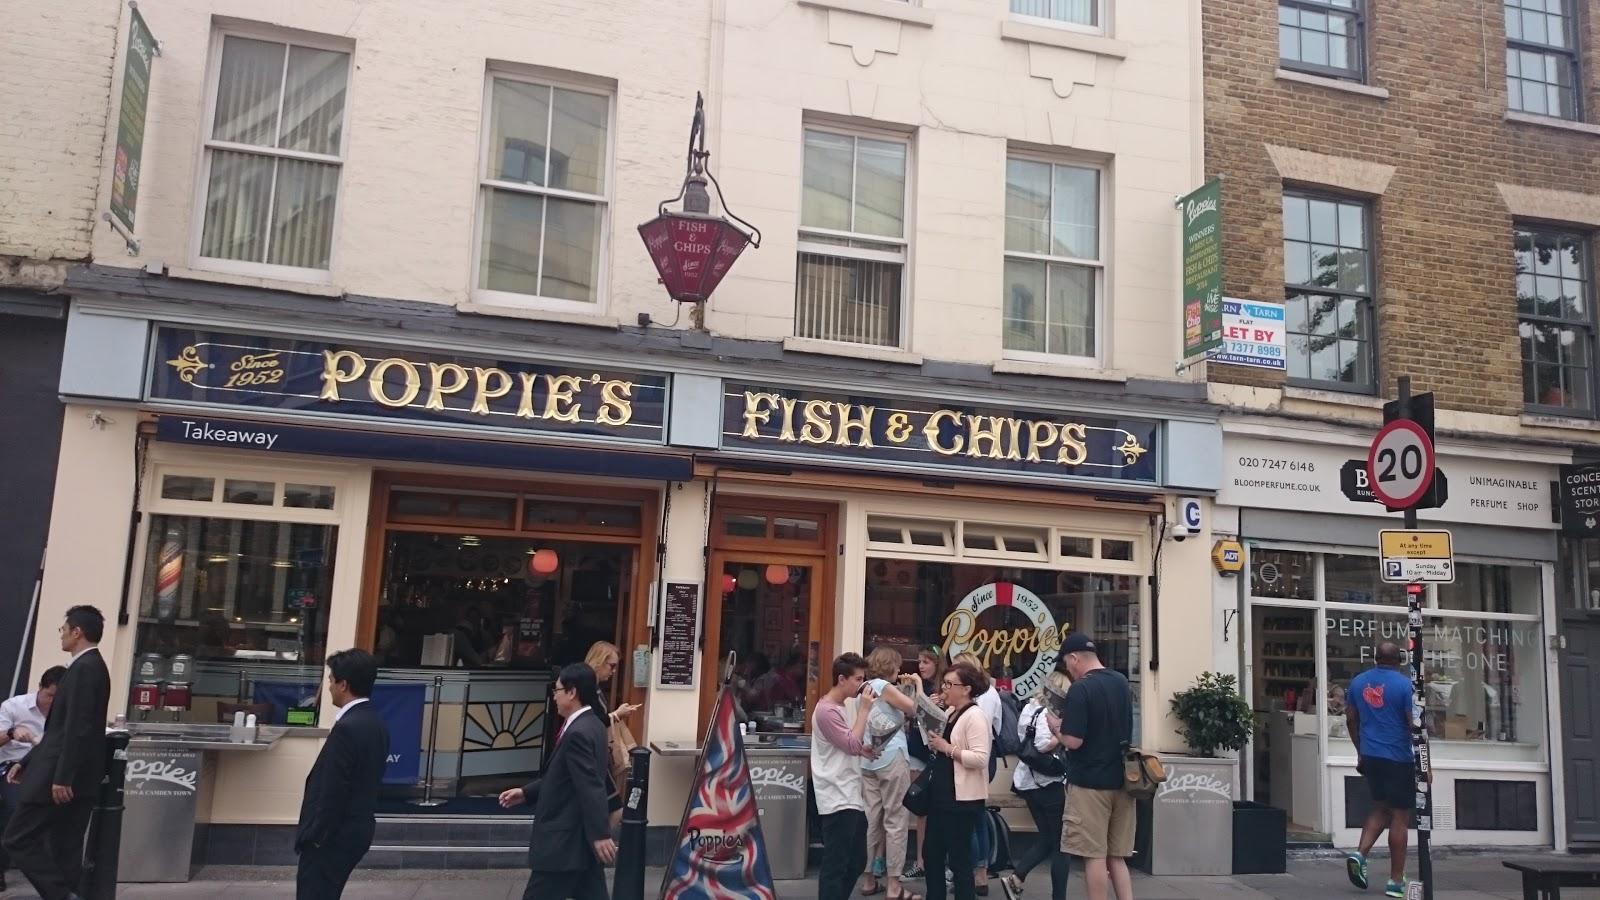 En el interior de Spitalfields también encontrarás un puesto del  restaurante e6fc8a23e3e9e